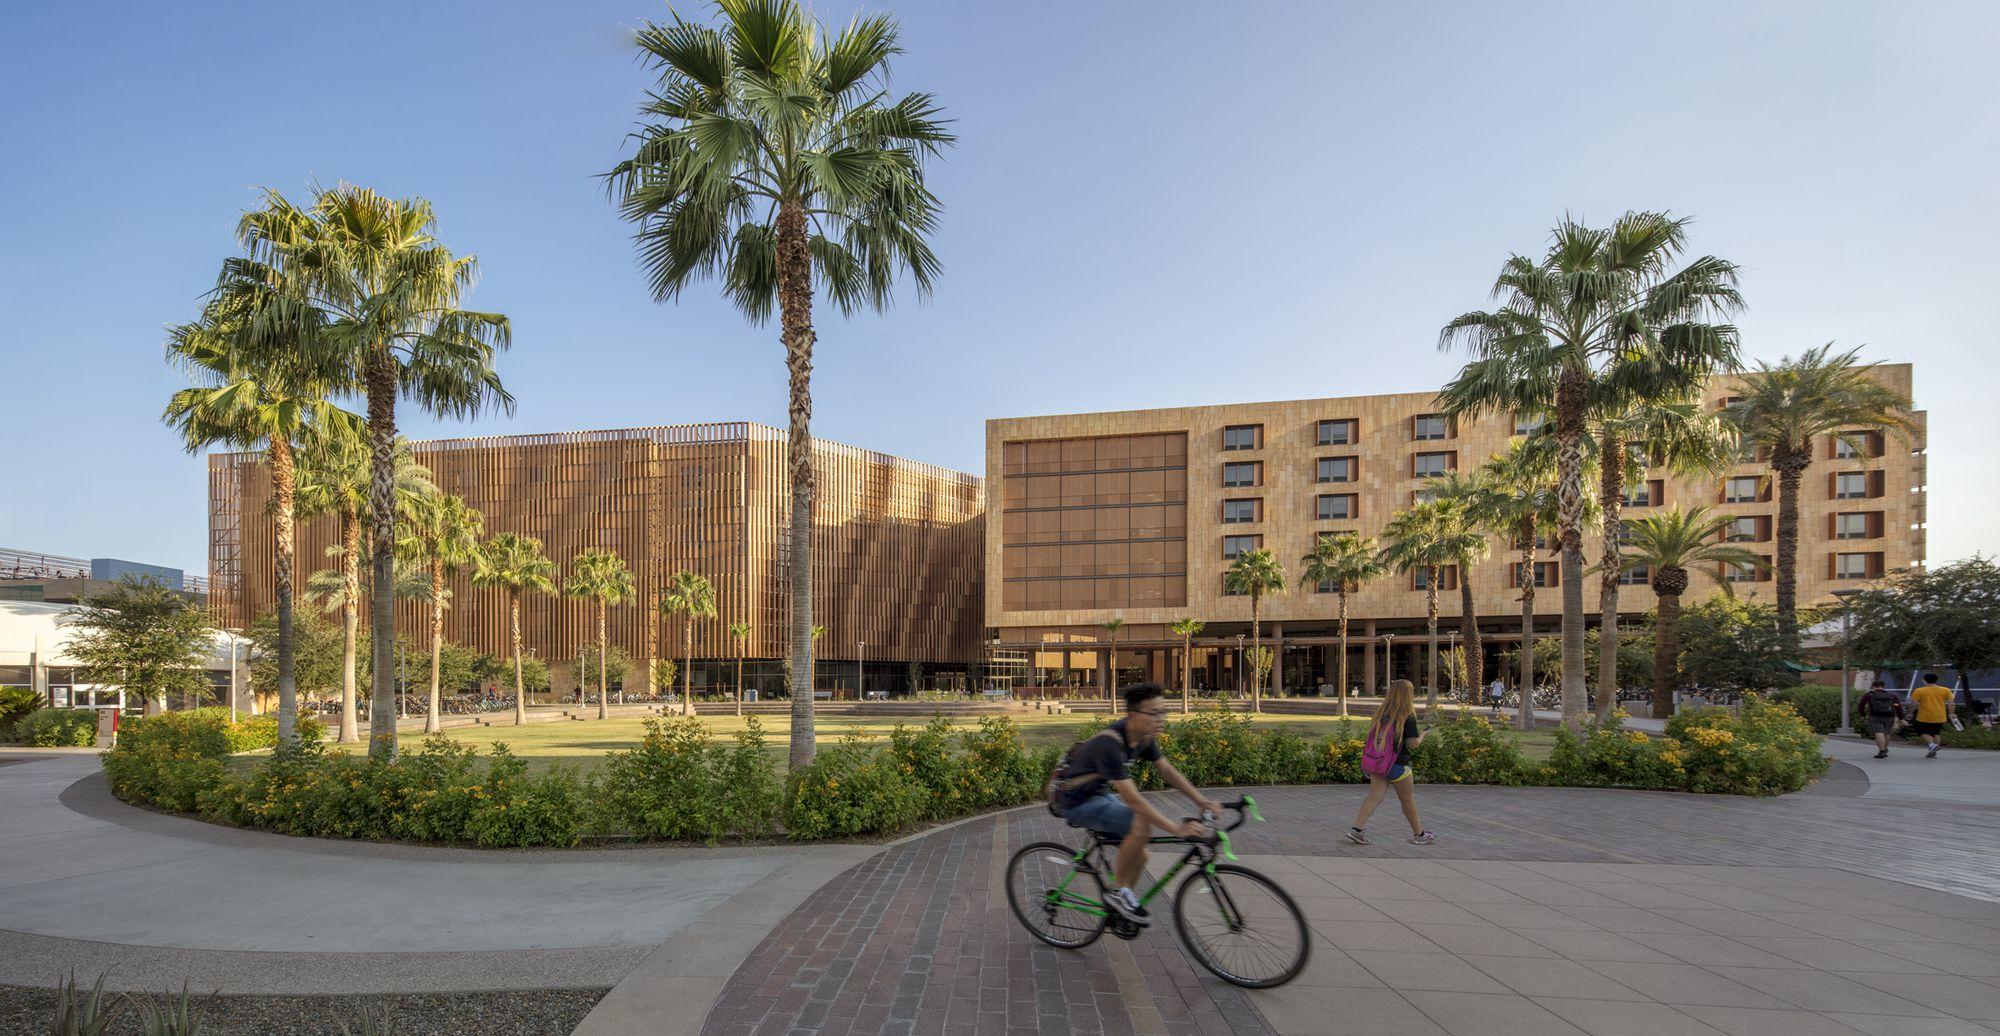 Tooker House At Arizona State University / Solomon Cordwell Buenz